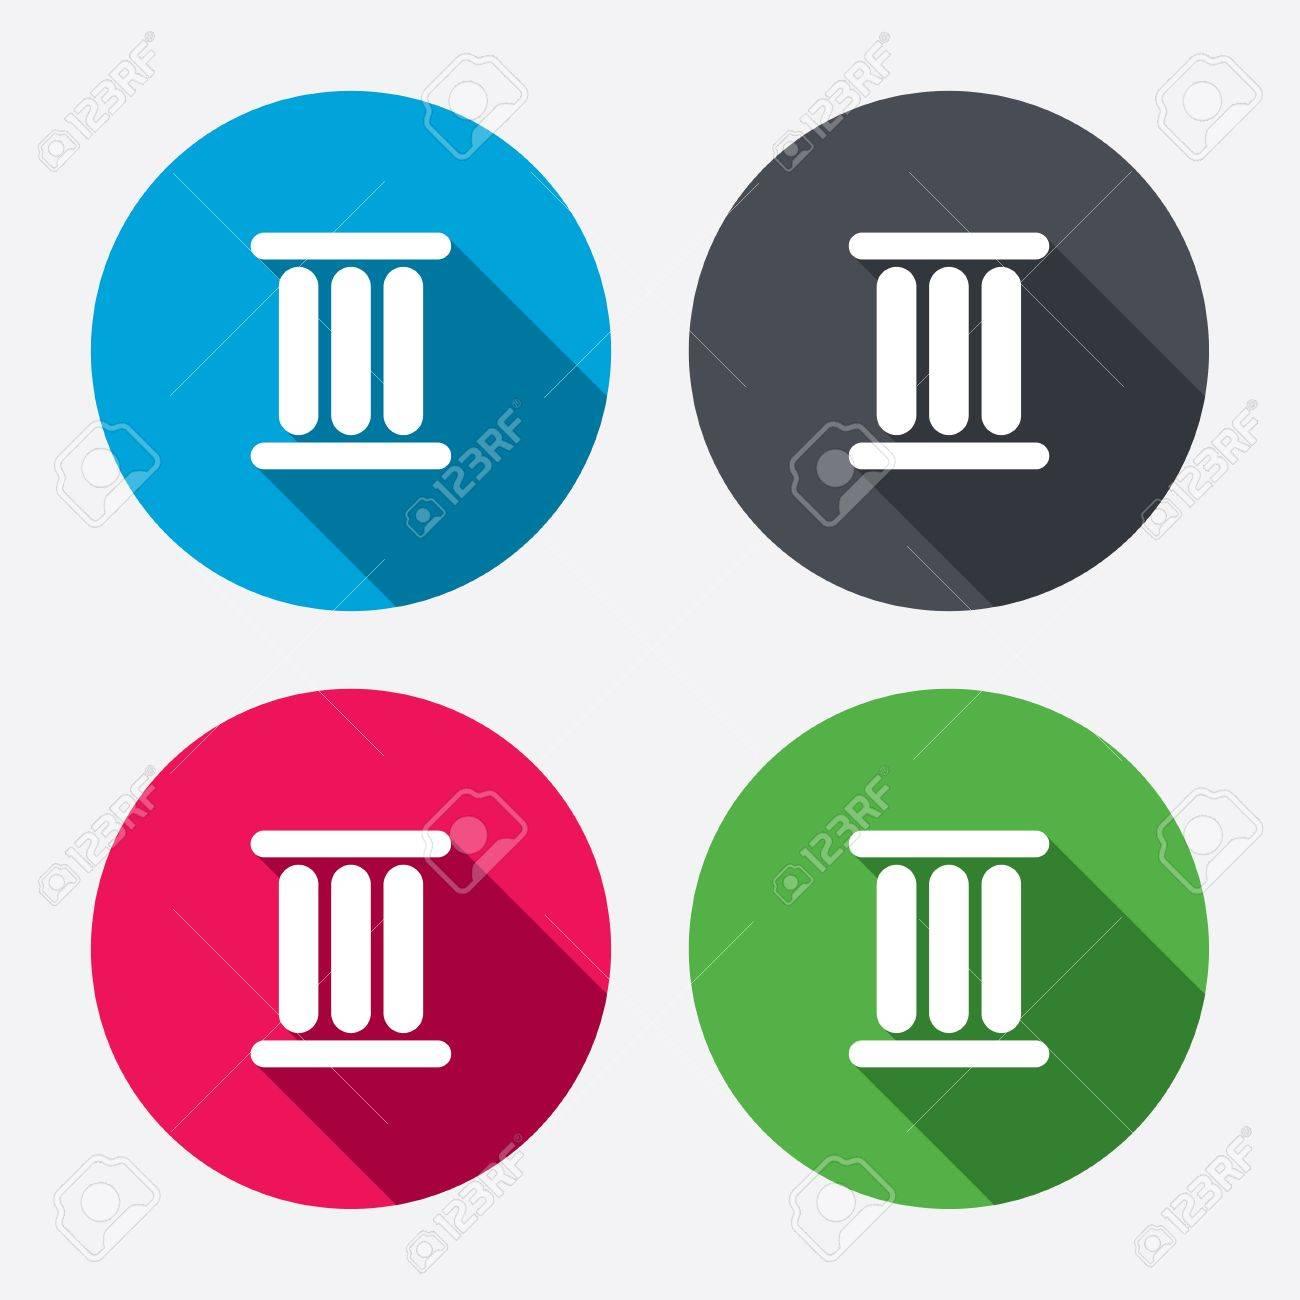 Chiffre Romain 4 chiffre romain trois signe icône. chiffre romain trois symbole